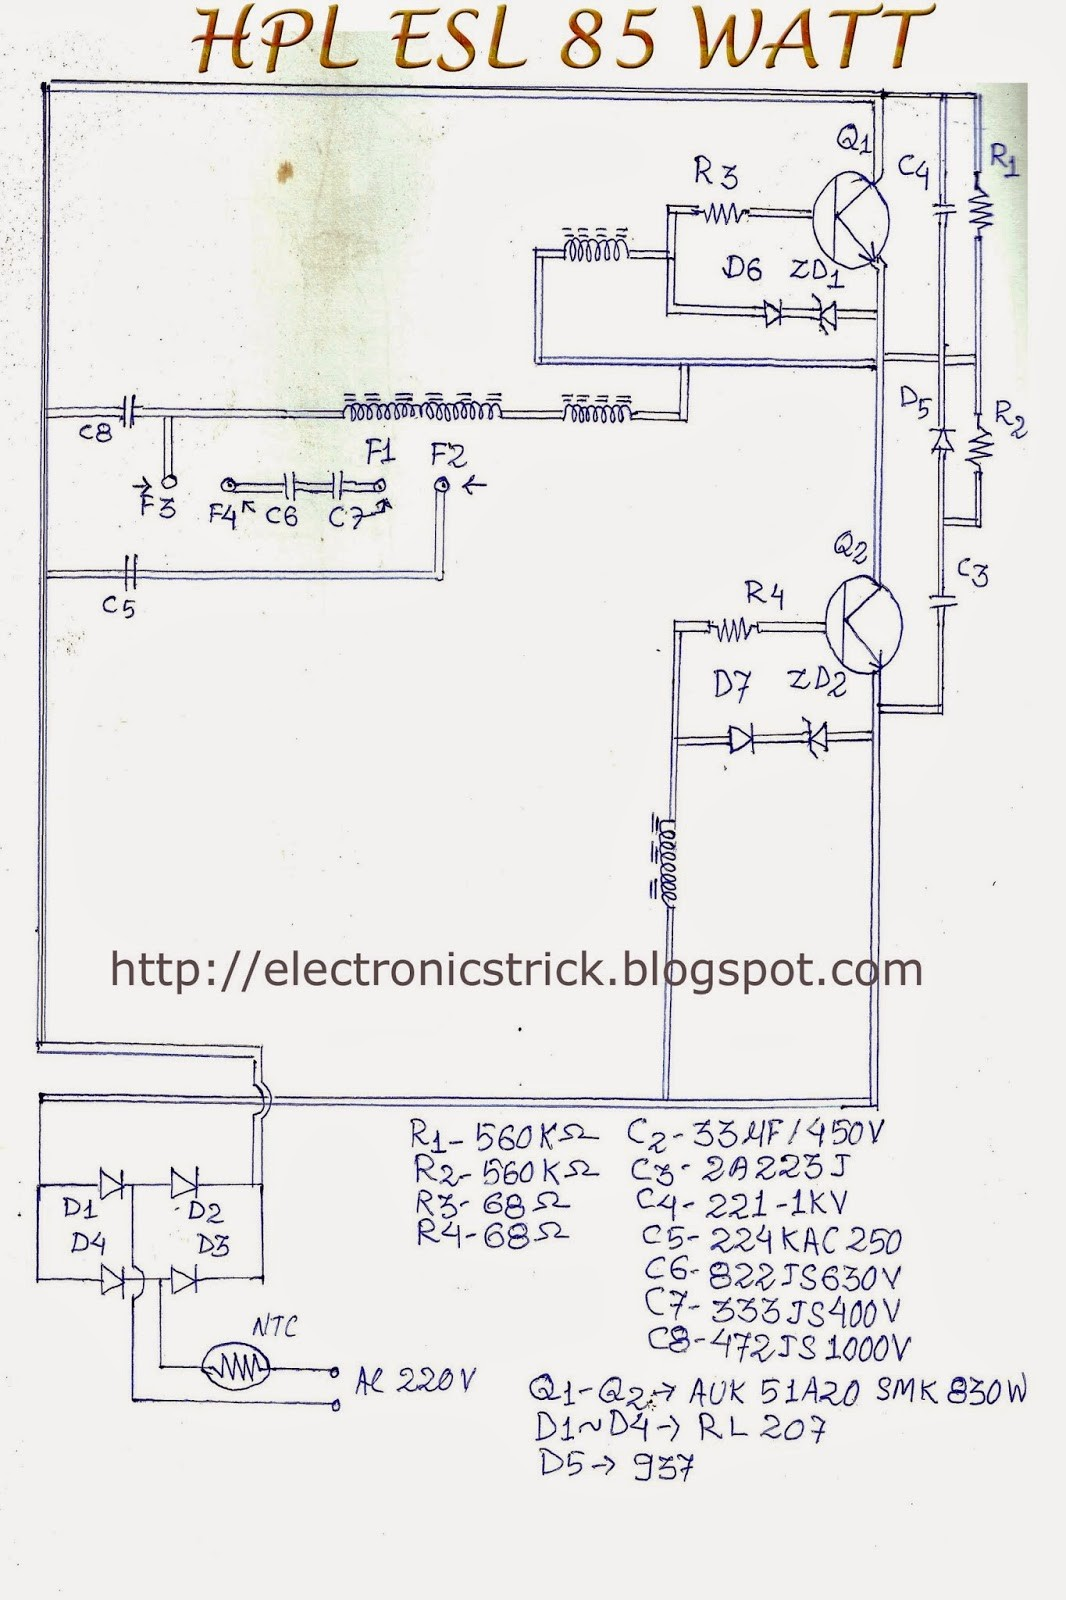 HCL ESL 85 WATT CFL BULB CKT DIAGRAM